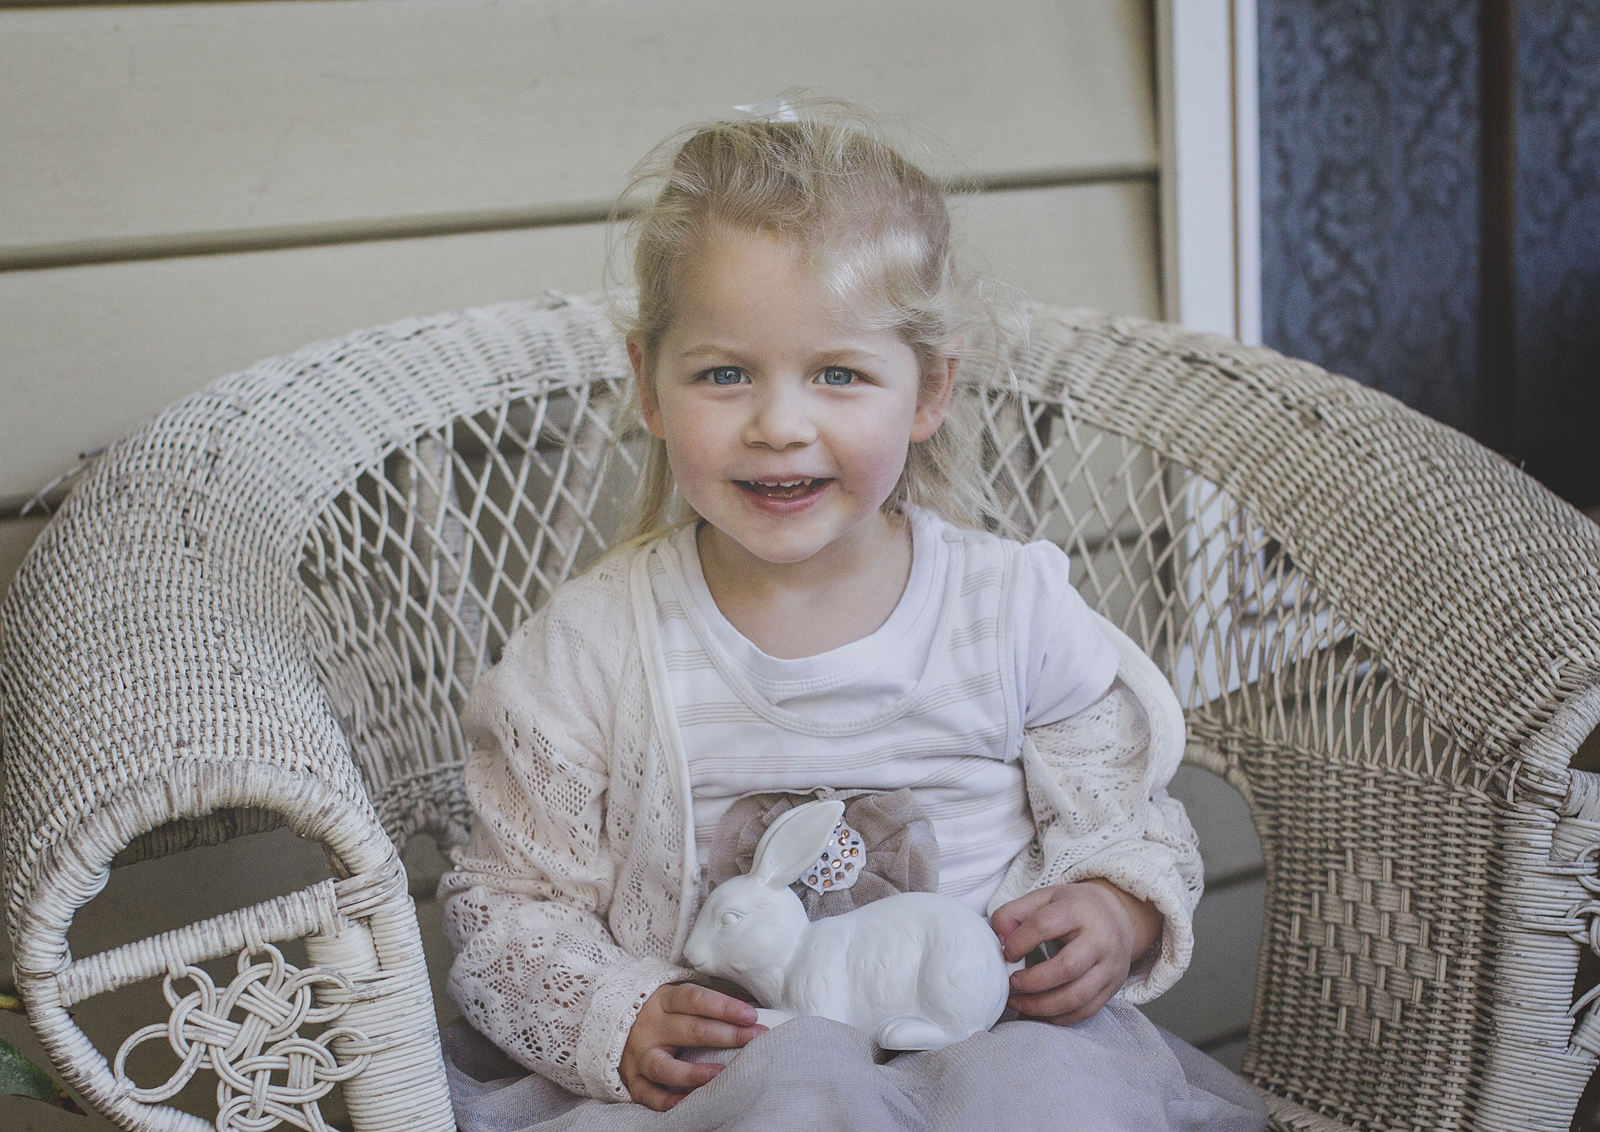 Children's Lifestyle Photographer Bayside, Melbourne